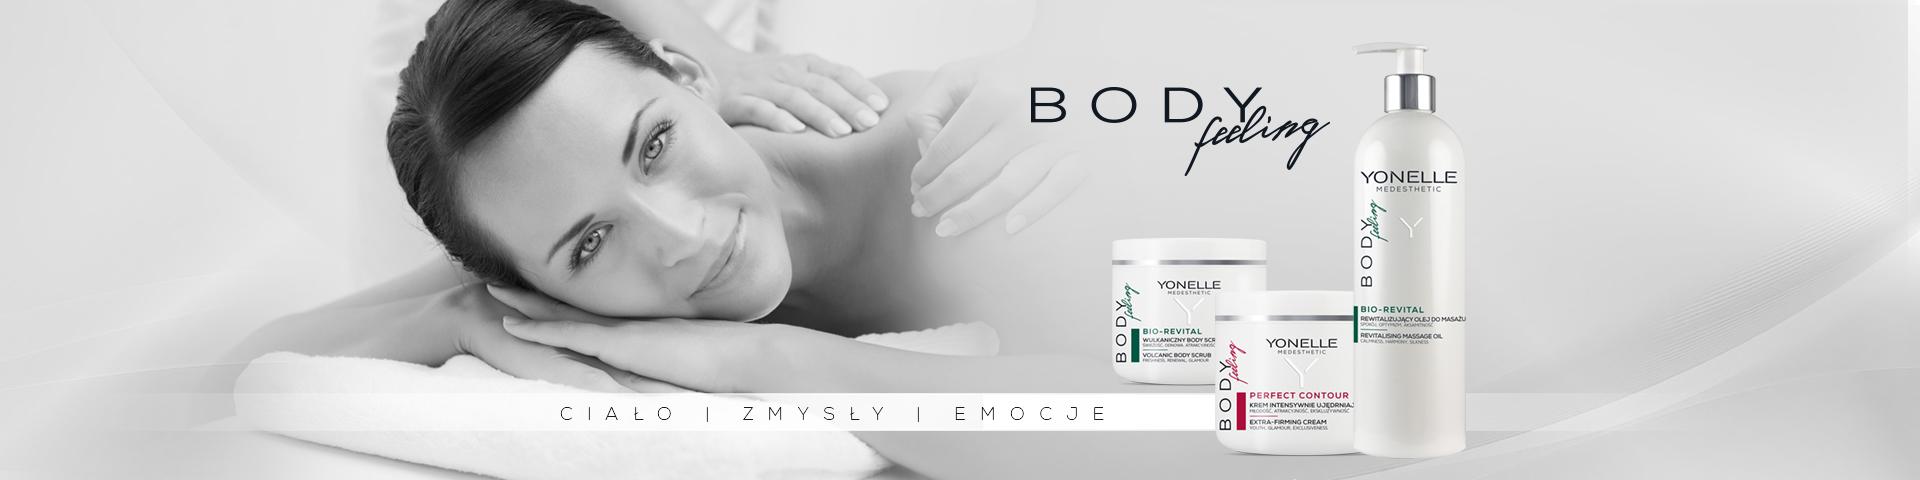 slide-kosmetyki8-MEDESTETIC-BodyFeeling4